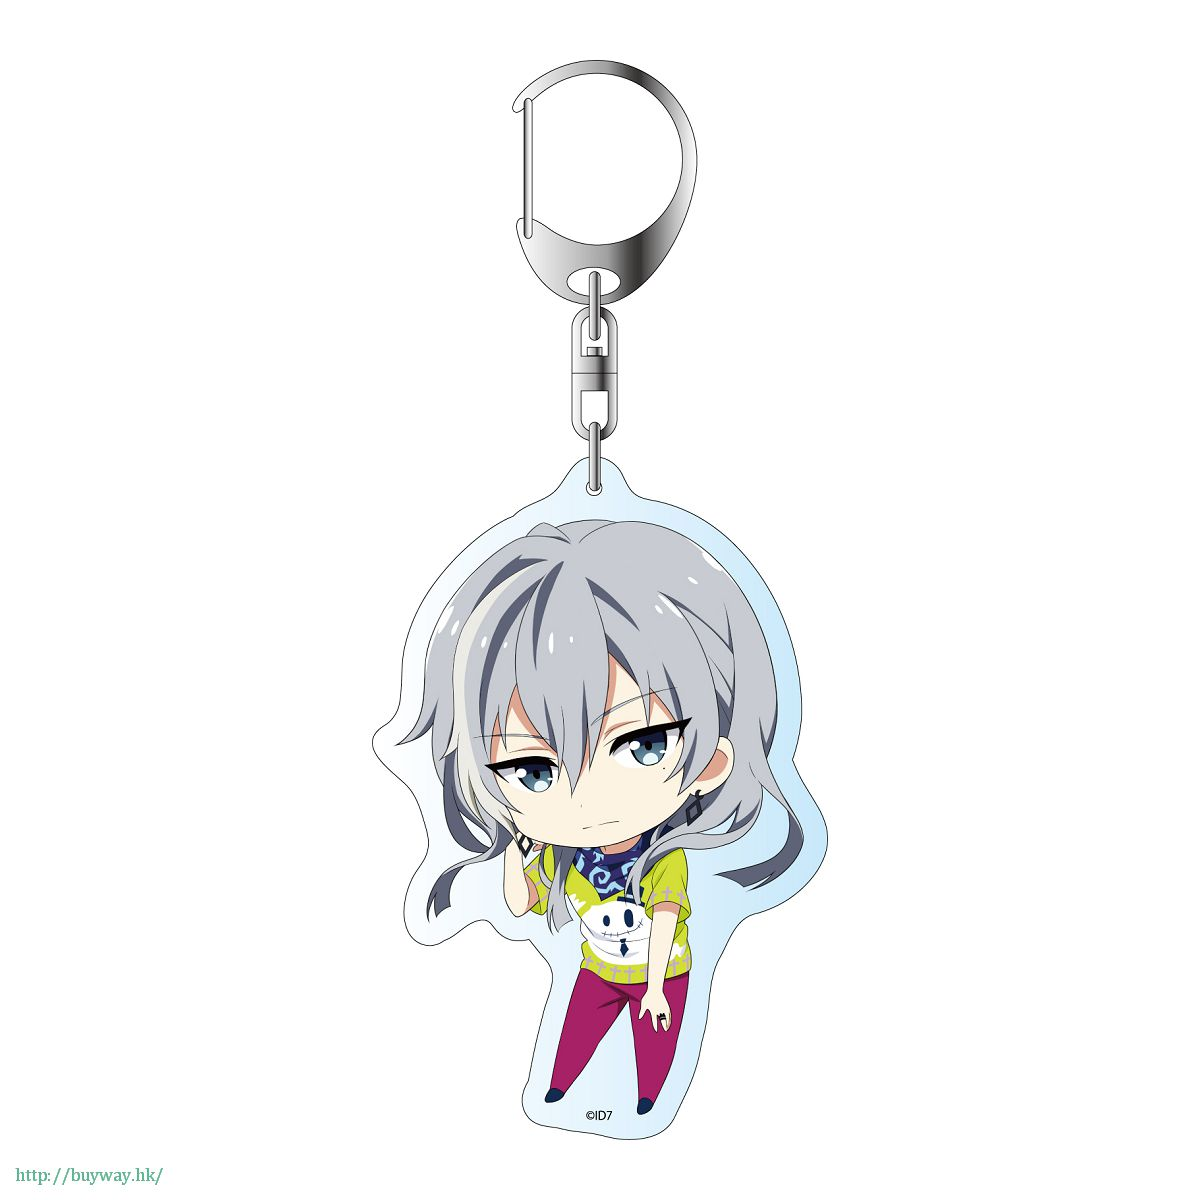 IDOLiSH7 「千」Monster Parade 亞克力匙扣 Monster Parade Acrylic Key Chain Yuki【IDOLiSH7】